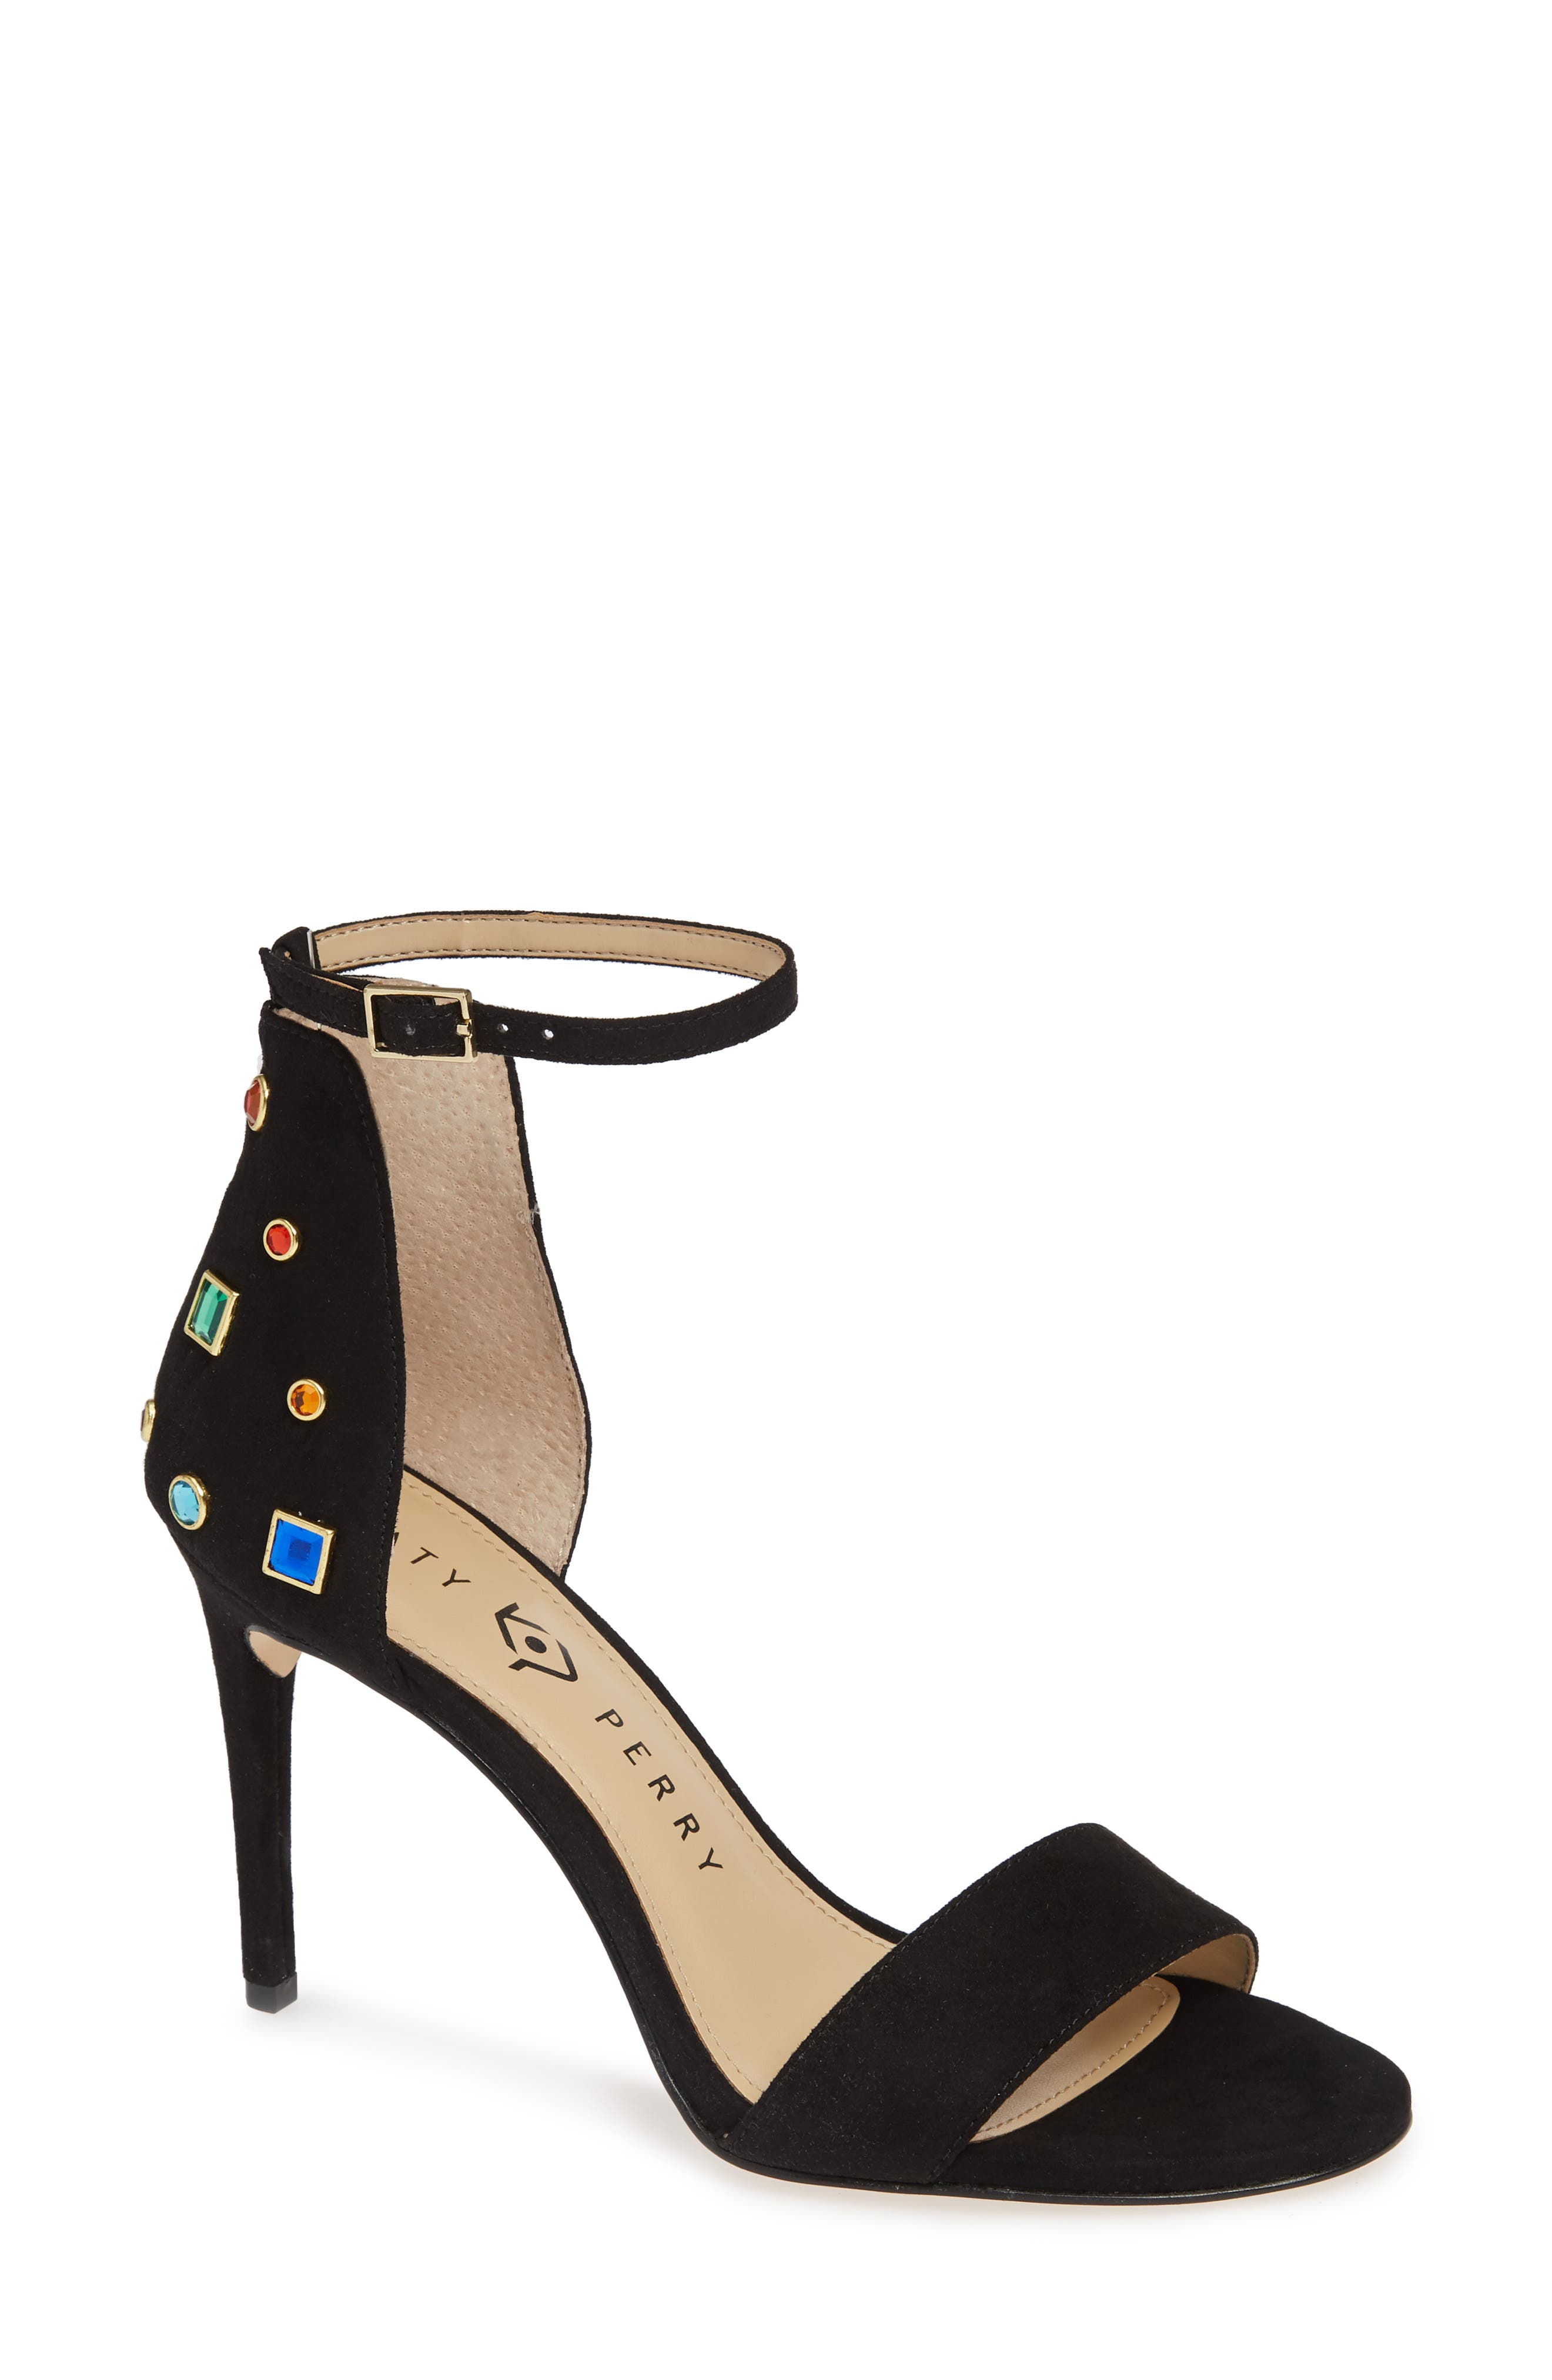 KATY PERRY Jewel Ankle Strap Sandal in Black